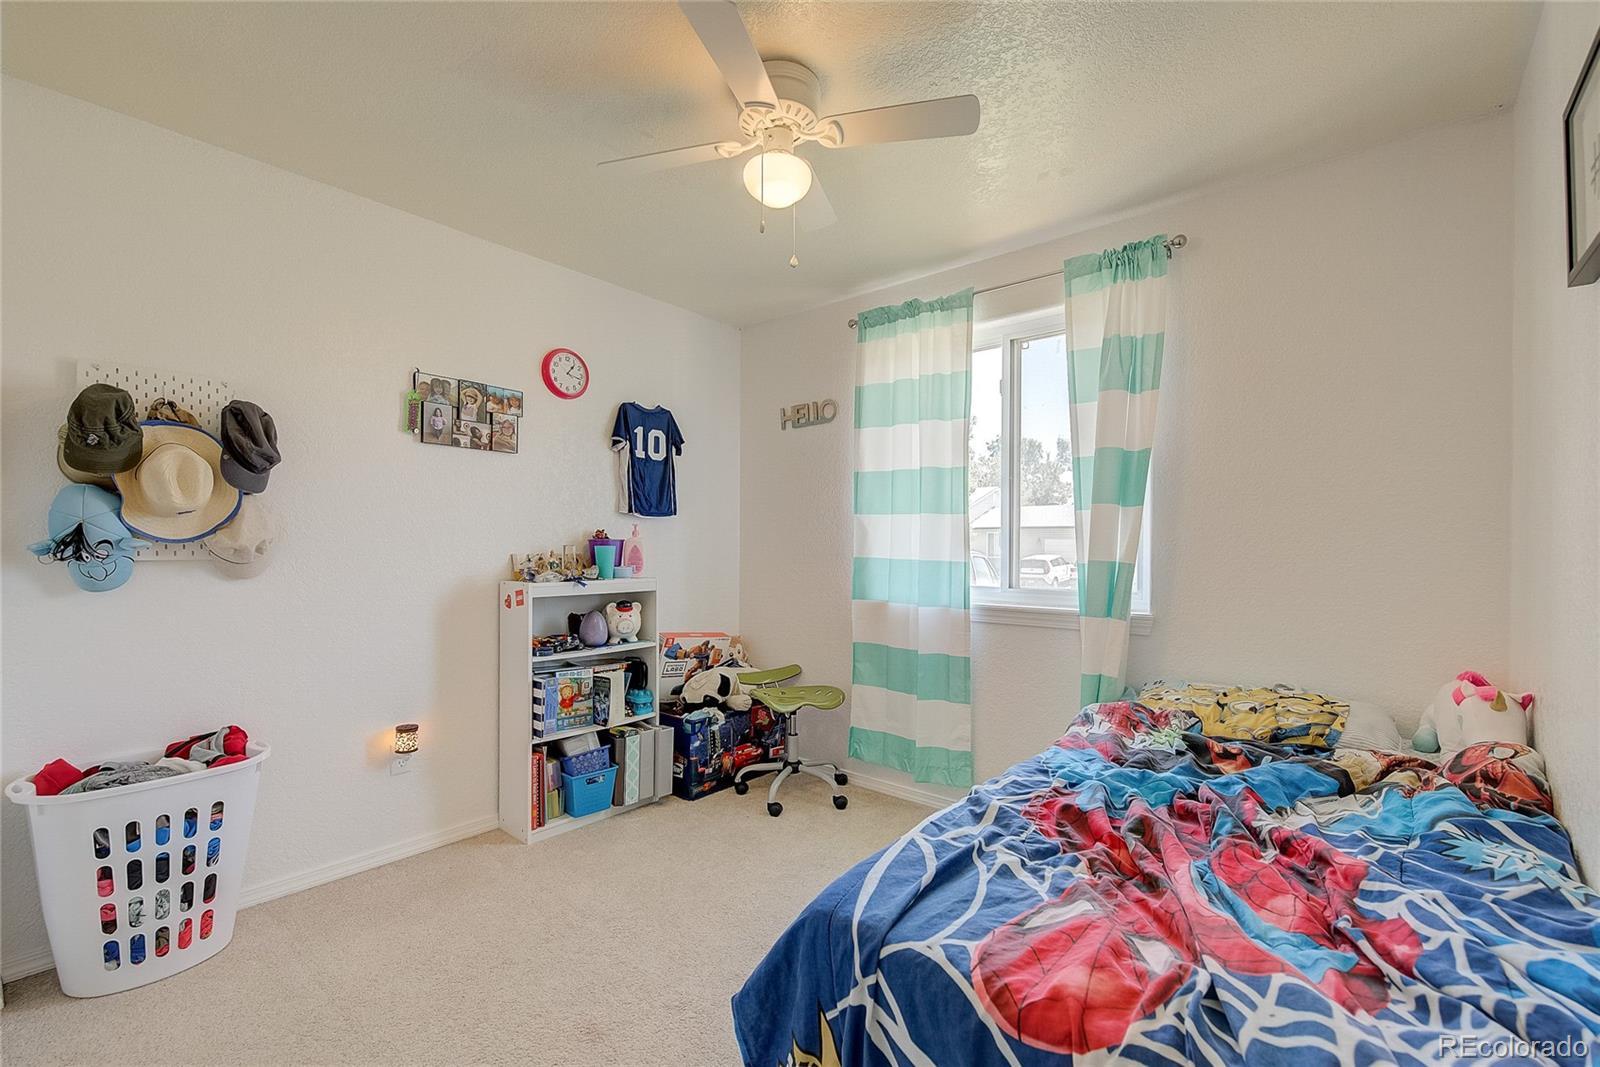 MLS# 8508886 - 17 - 11473 Garfield Street, Thornton, CO 80233